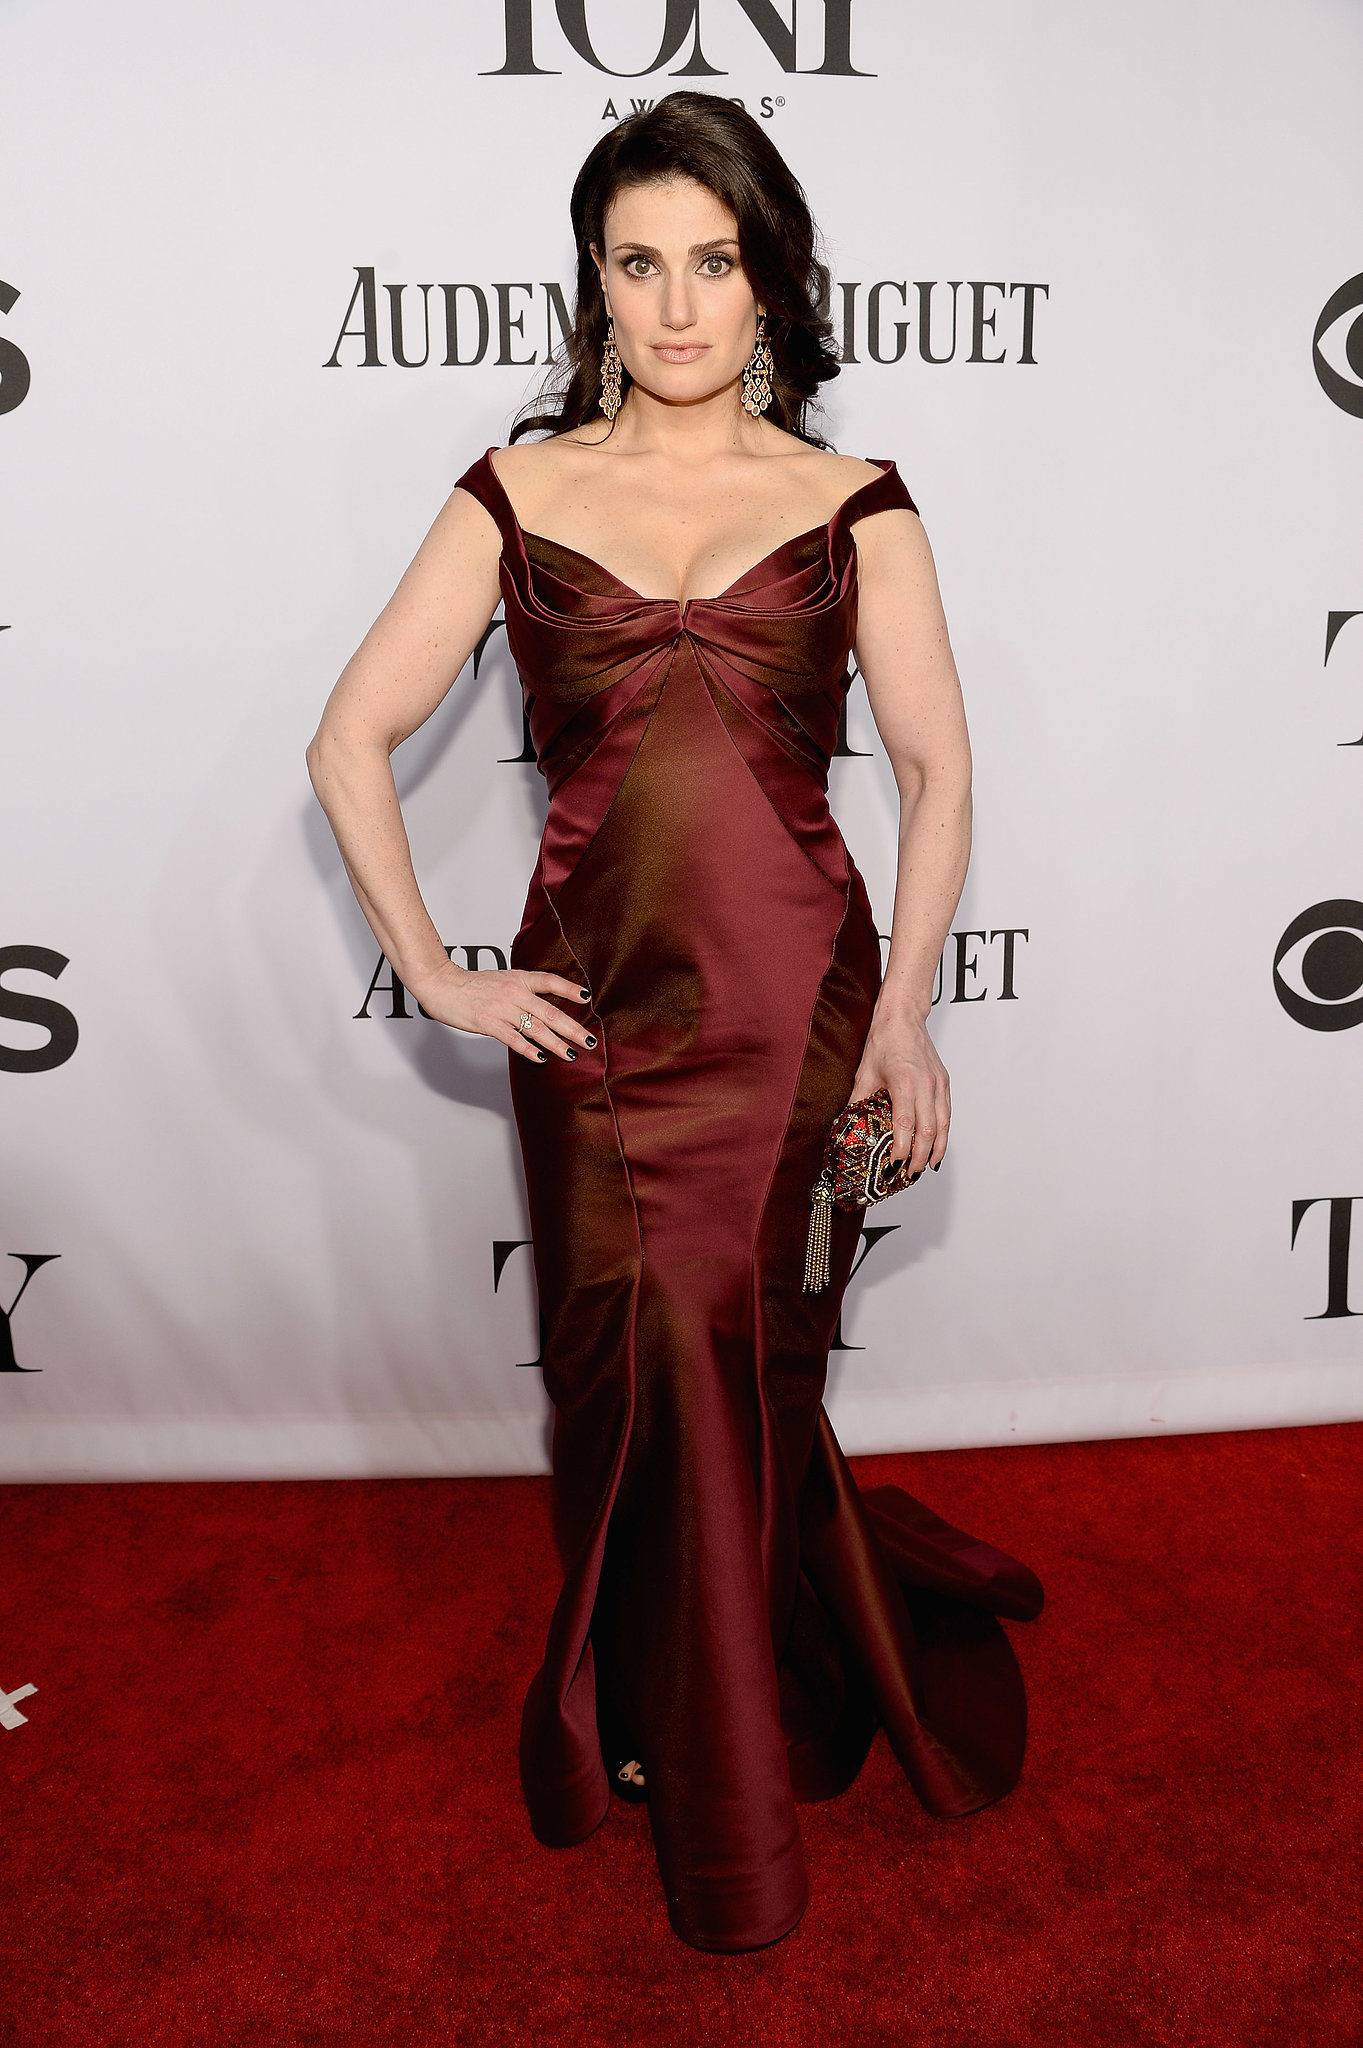 Idina Menzel wore a dark red frock.